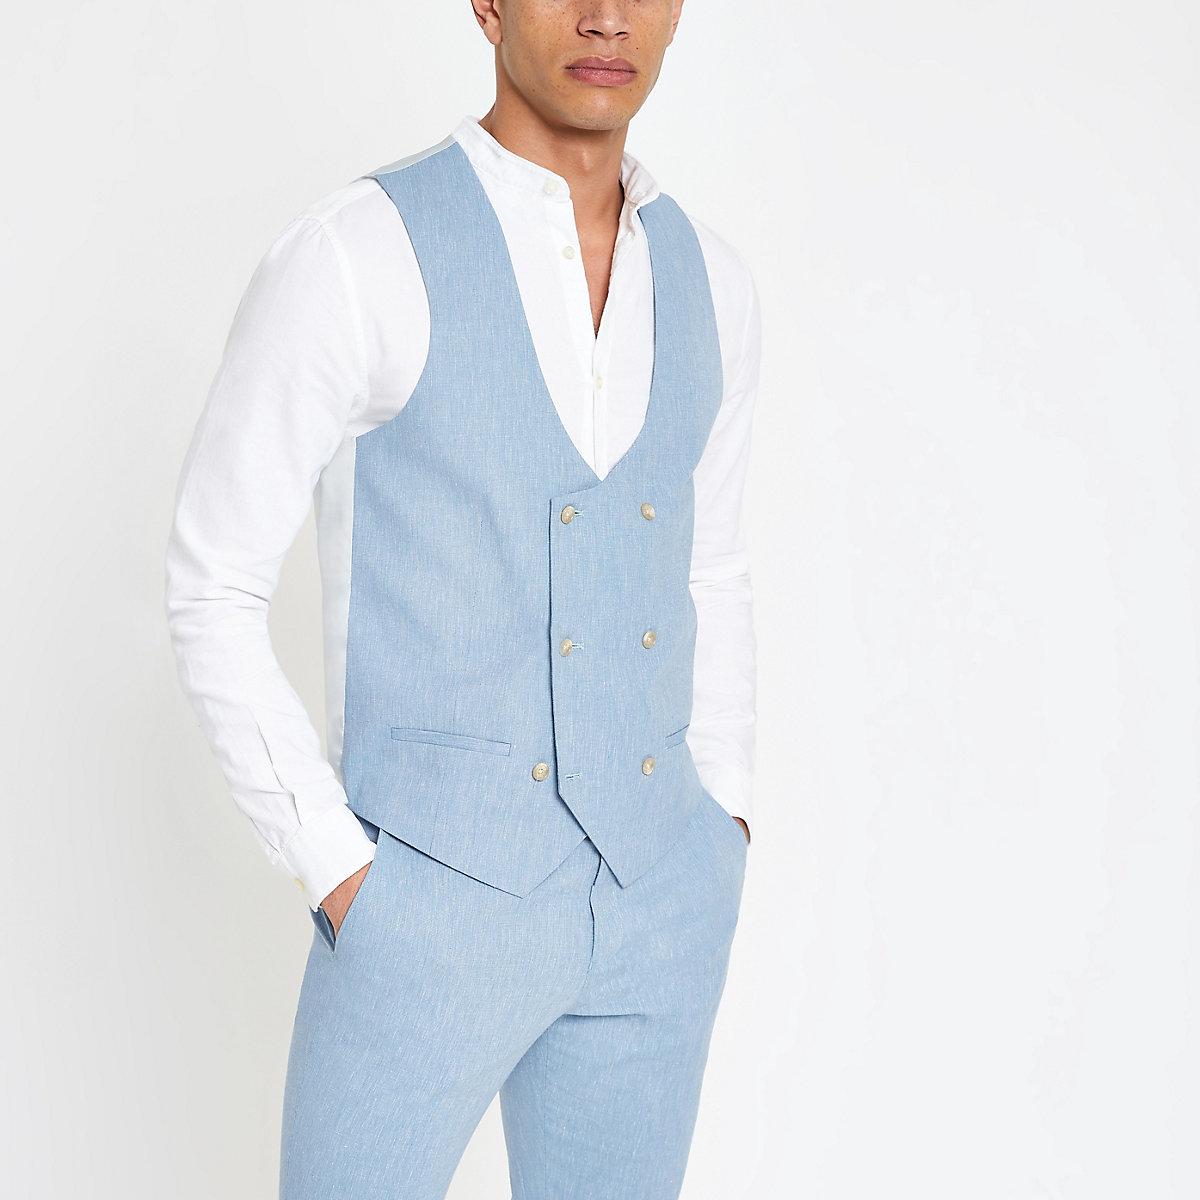 Light blue linen vest